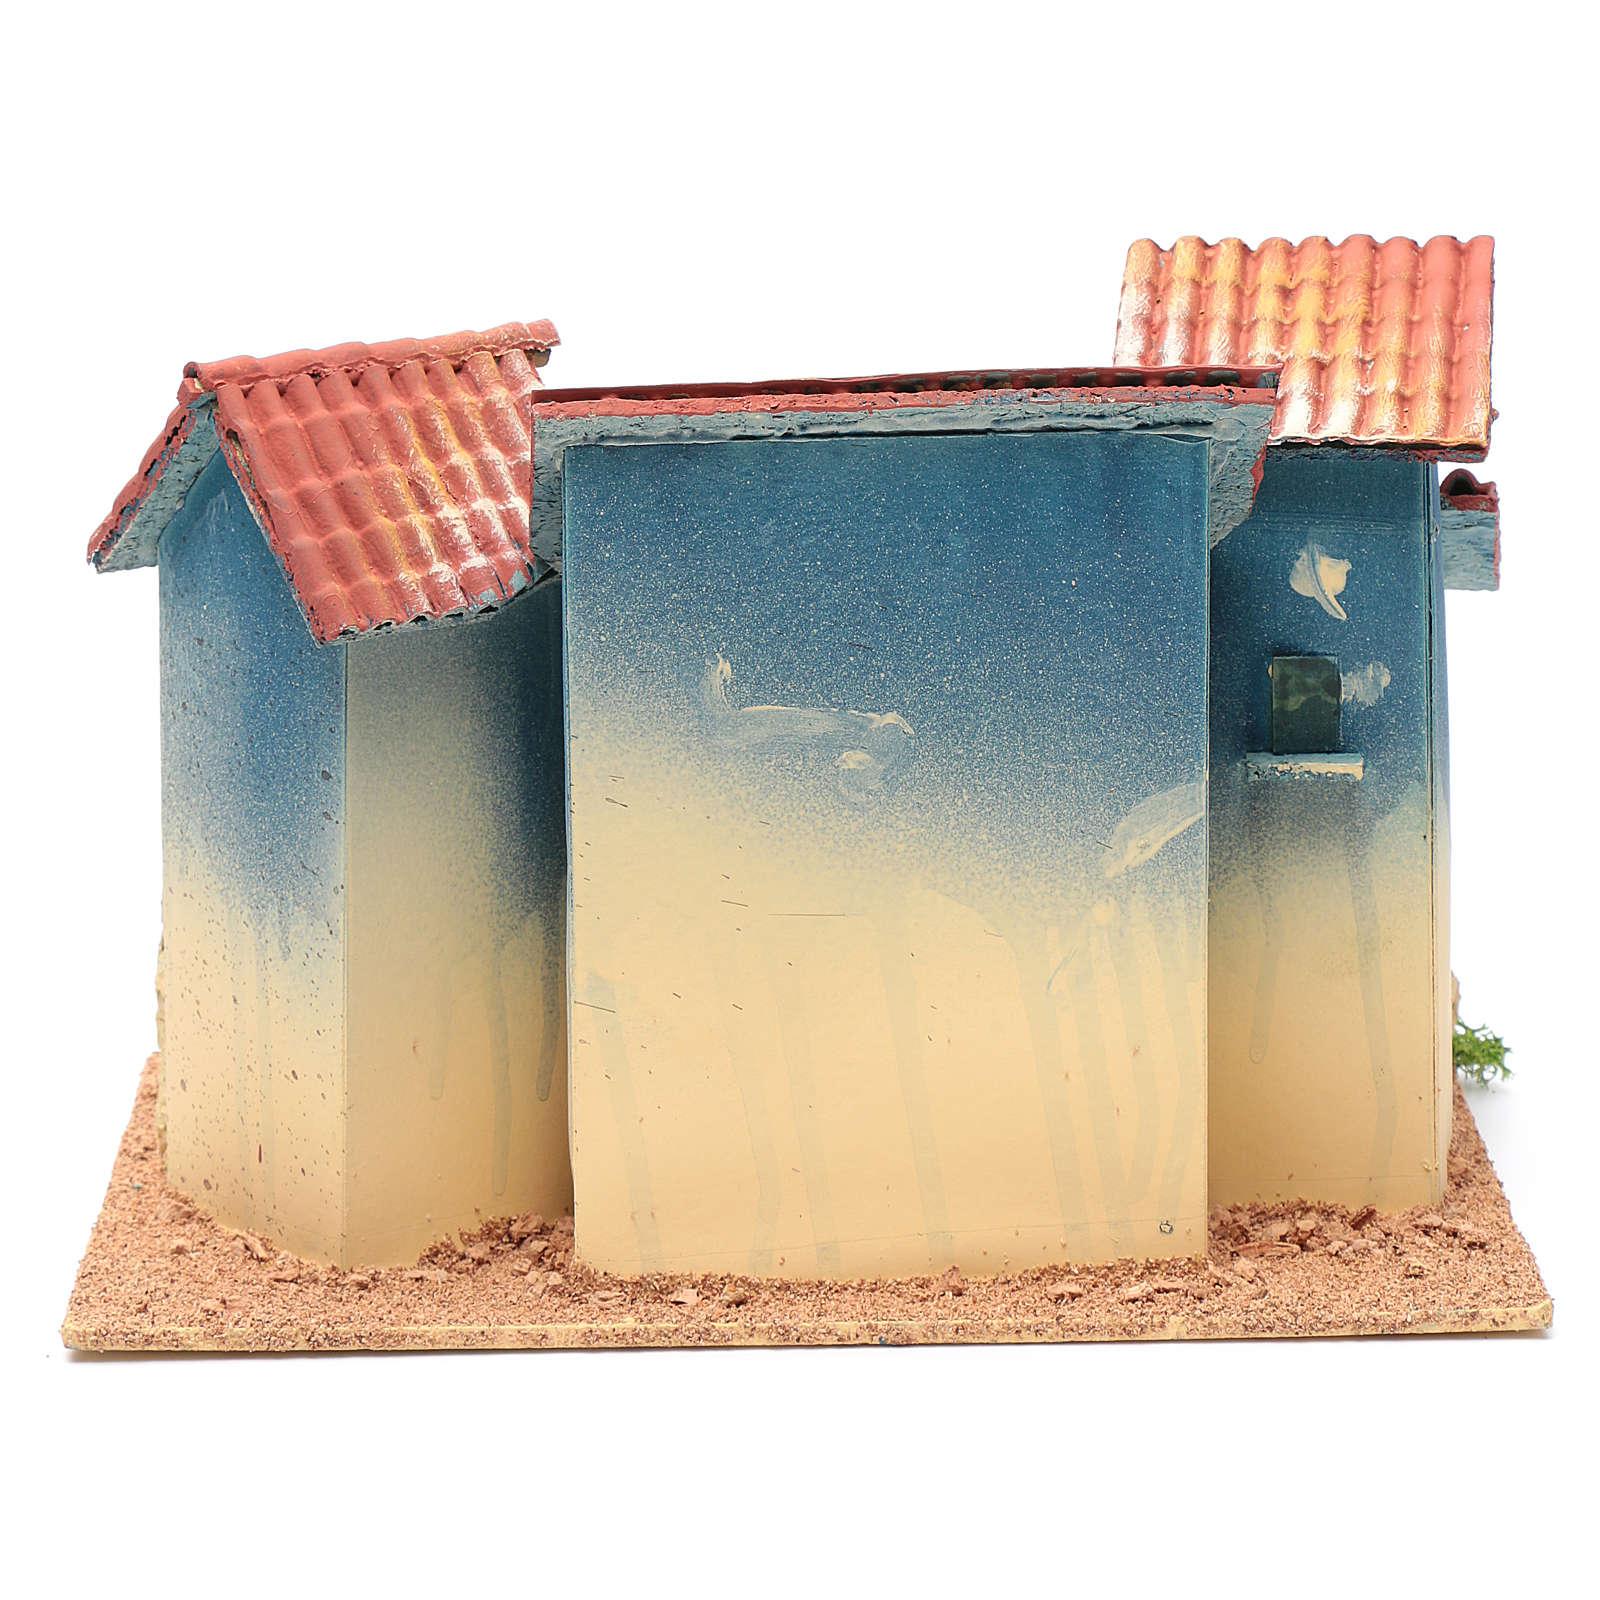 Borgo case e capannina 20x30x20 cm 4